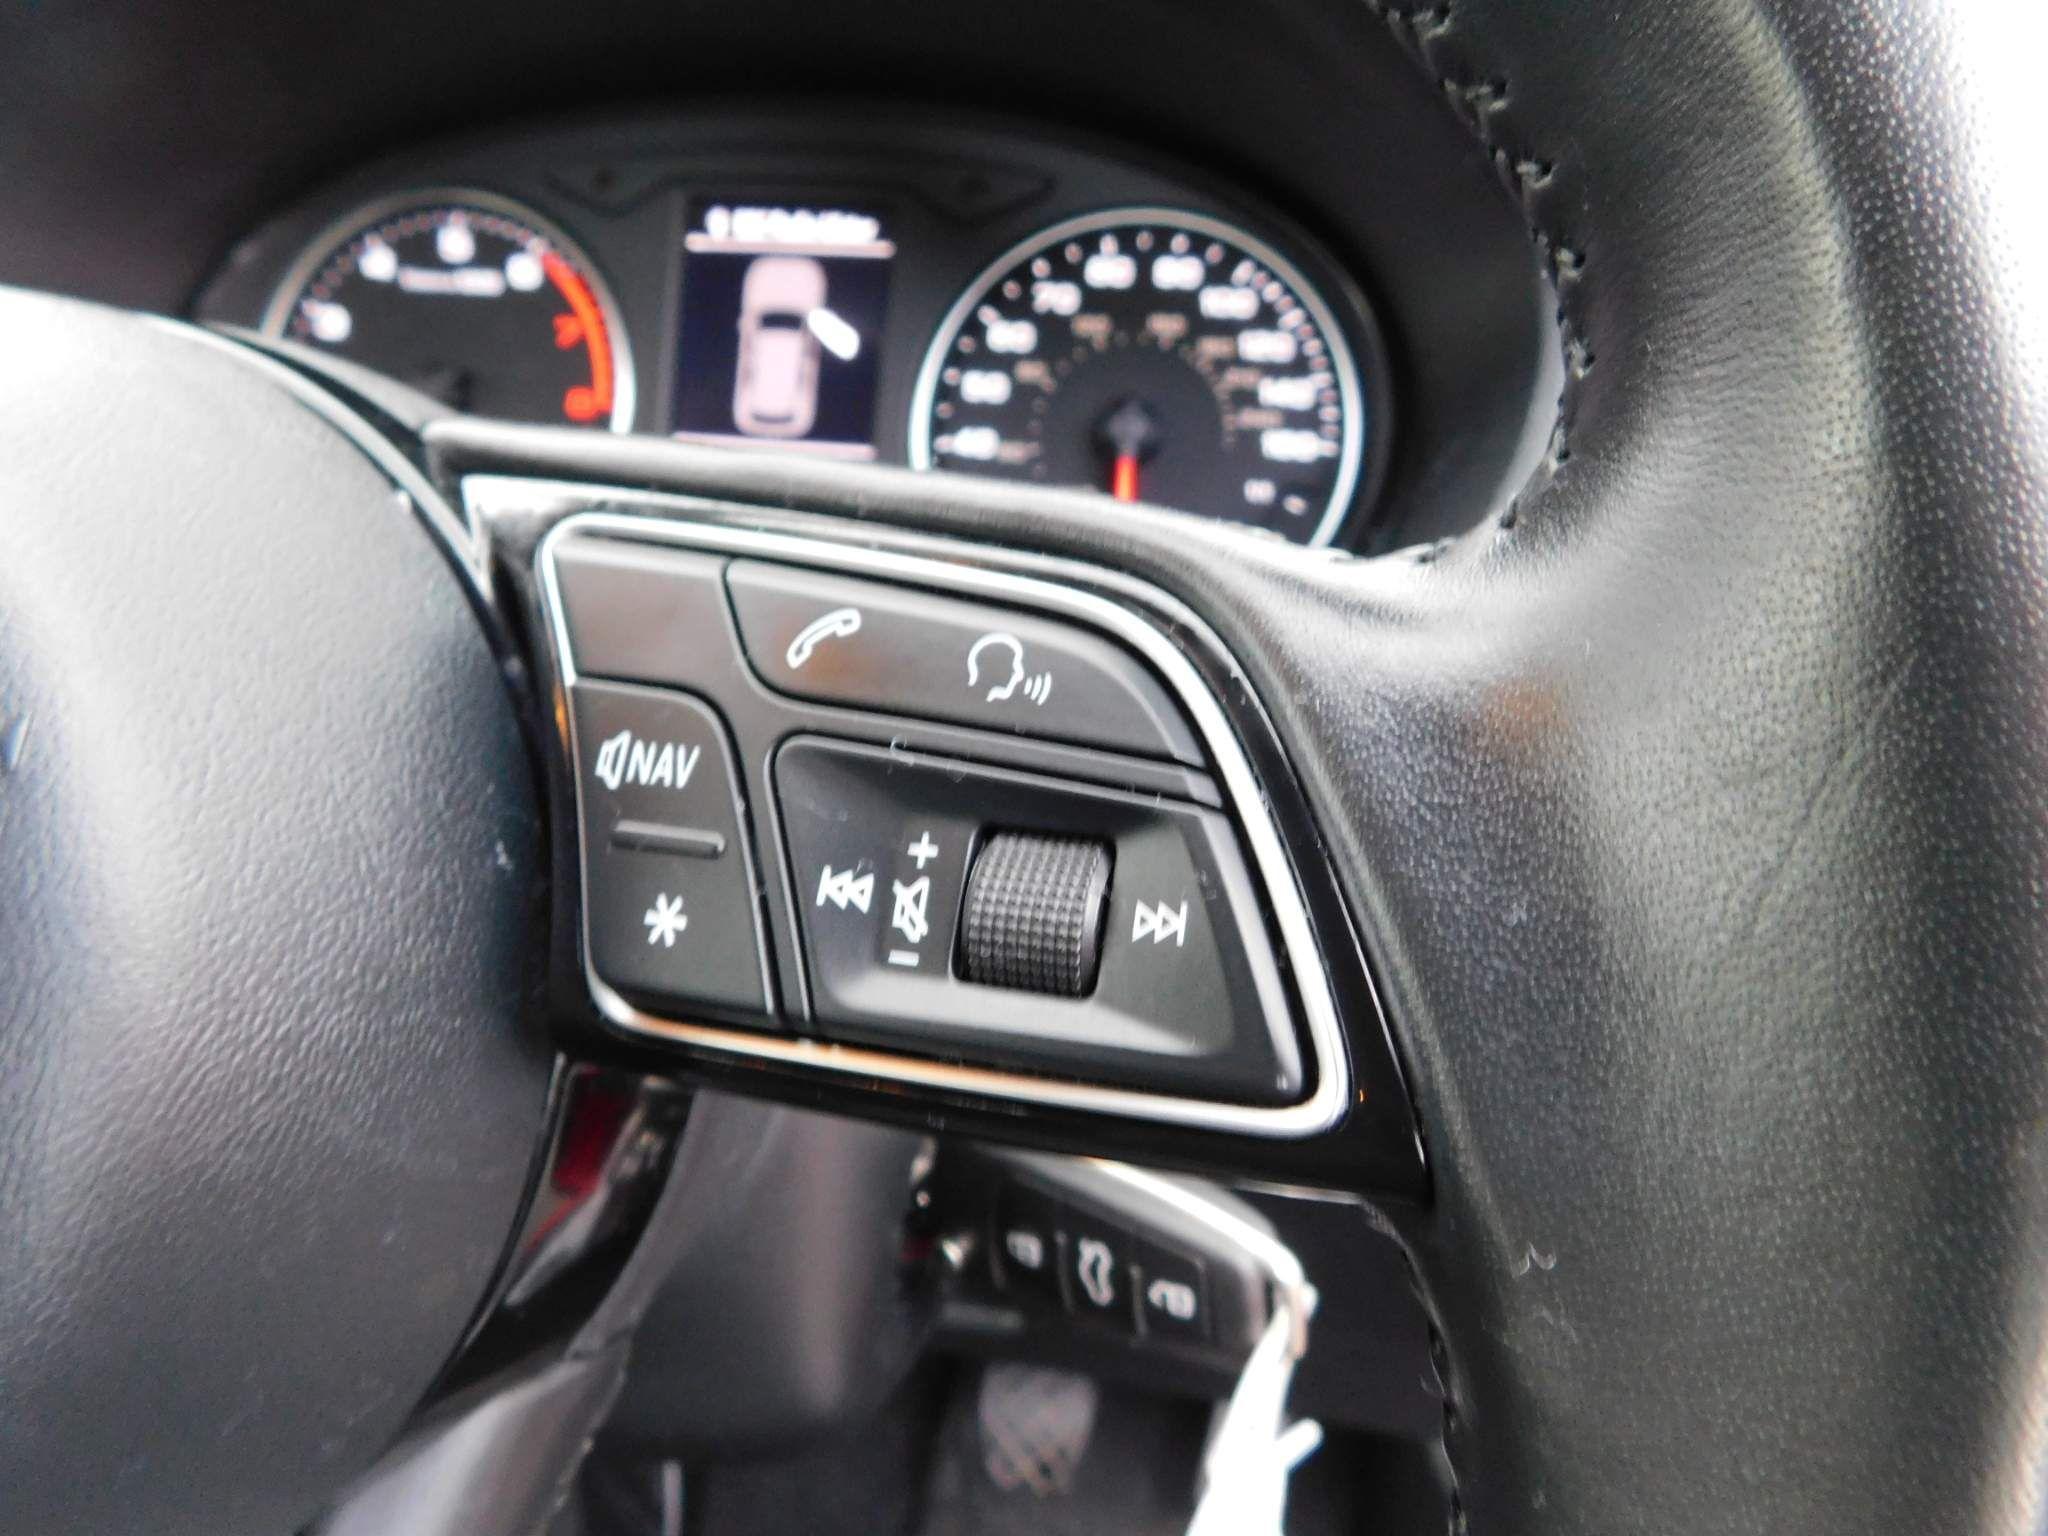 2018 AUDI Q2 1.0 TFSI Sport (s/s) Petrol Manual just arrived – Meadow Cars Carrickfergus full